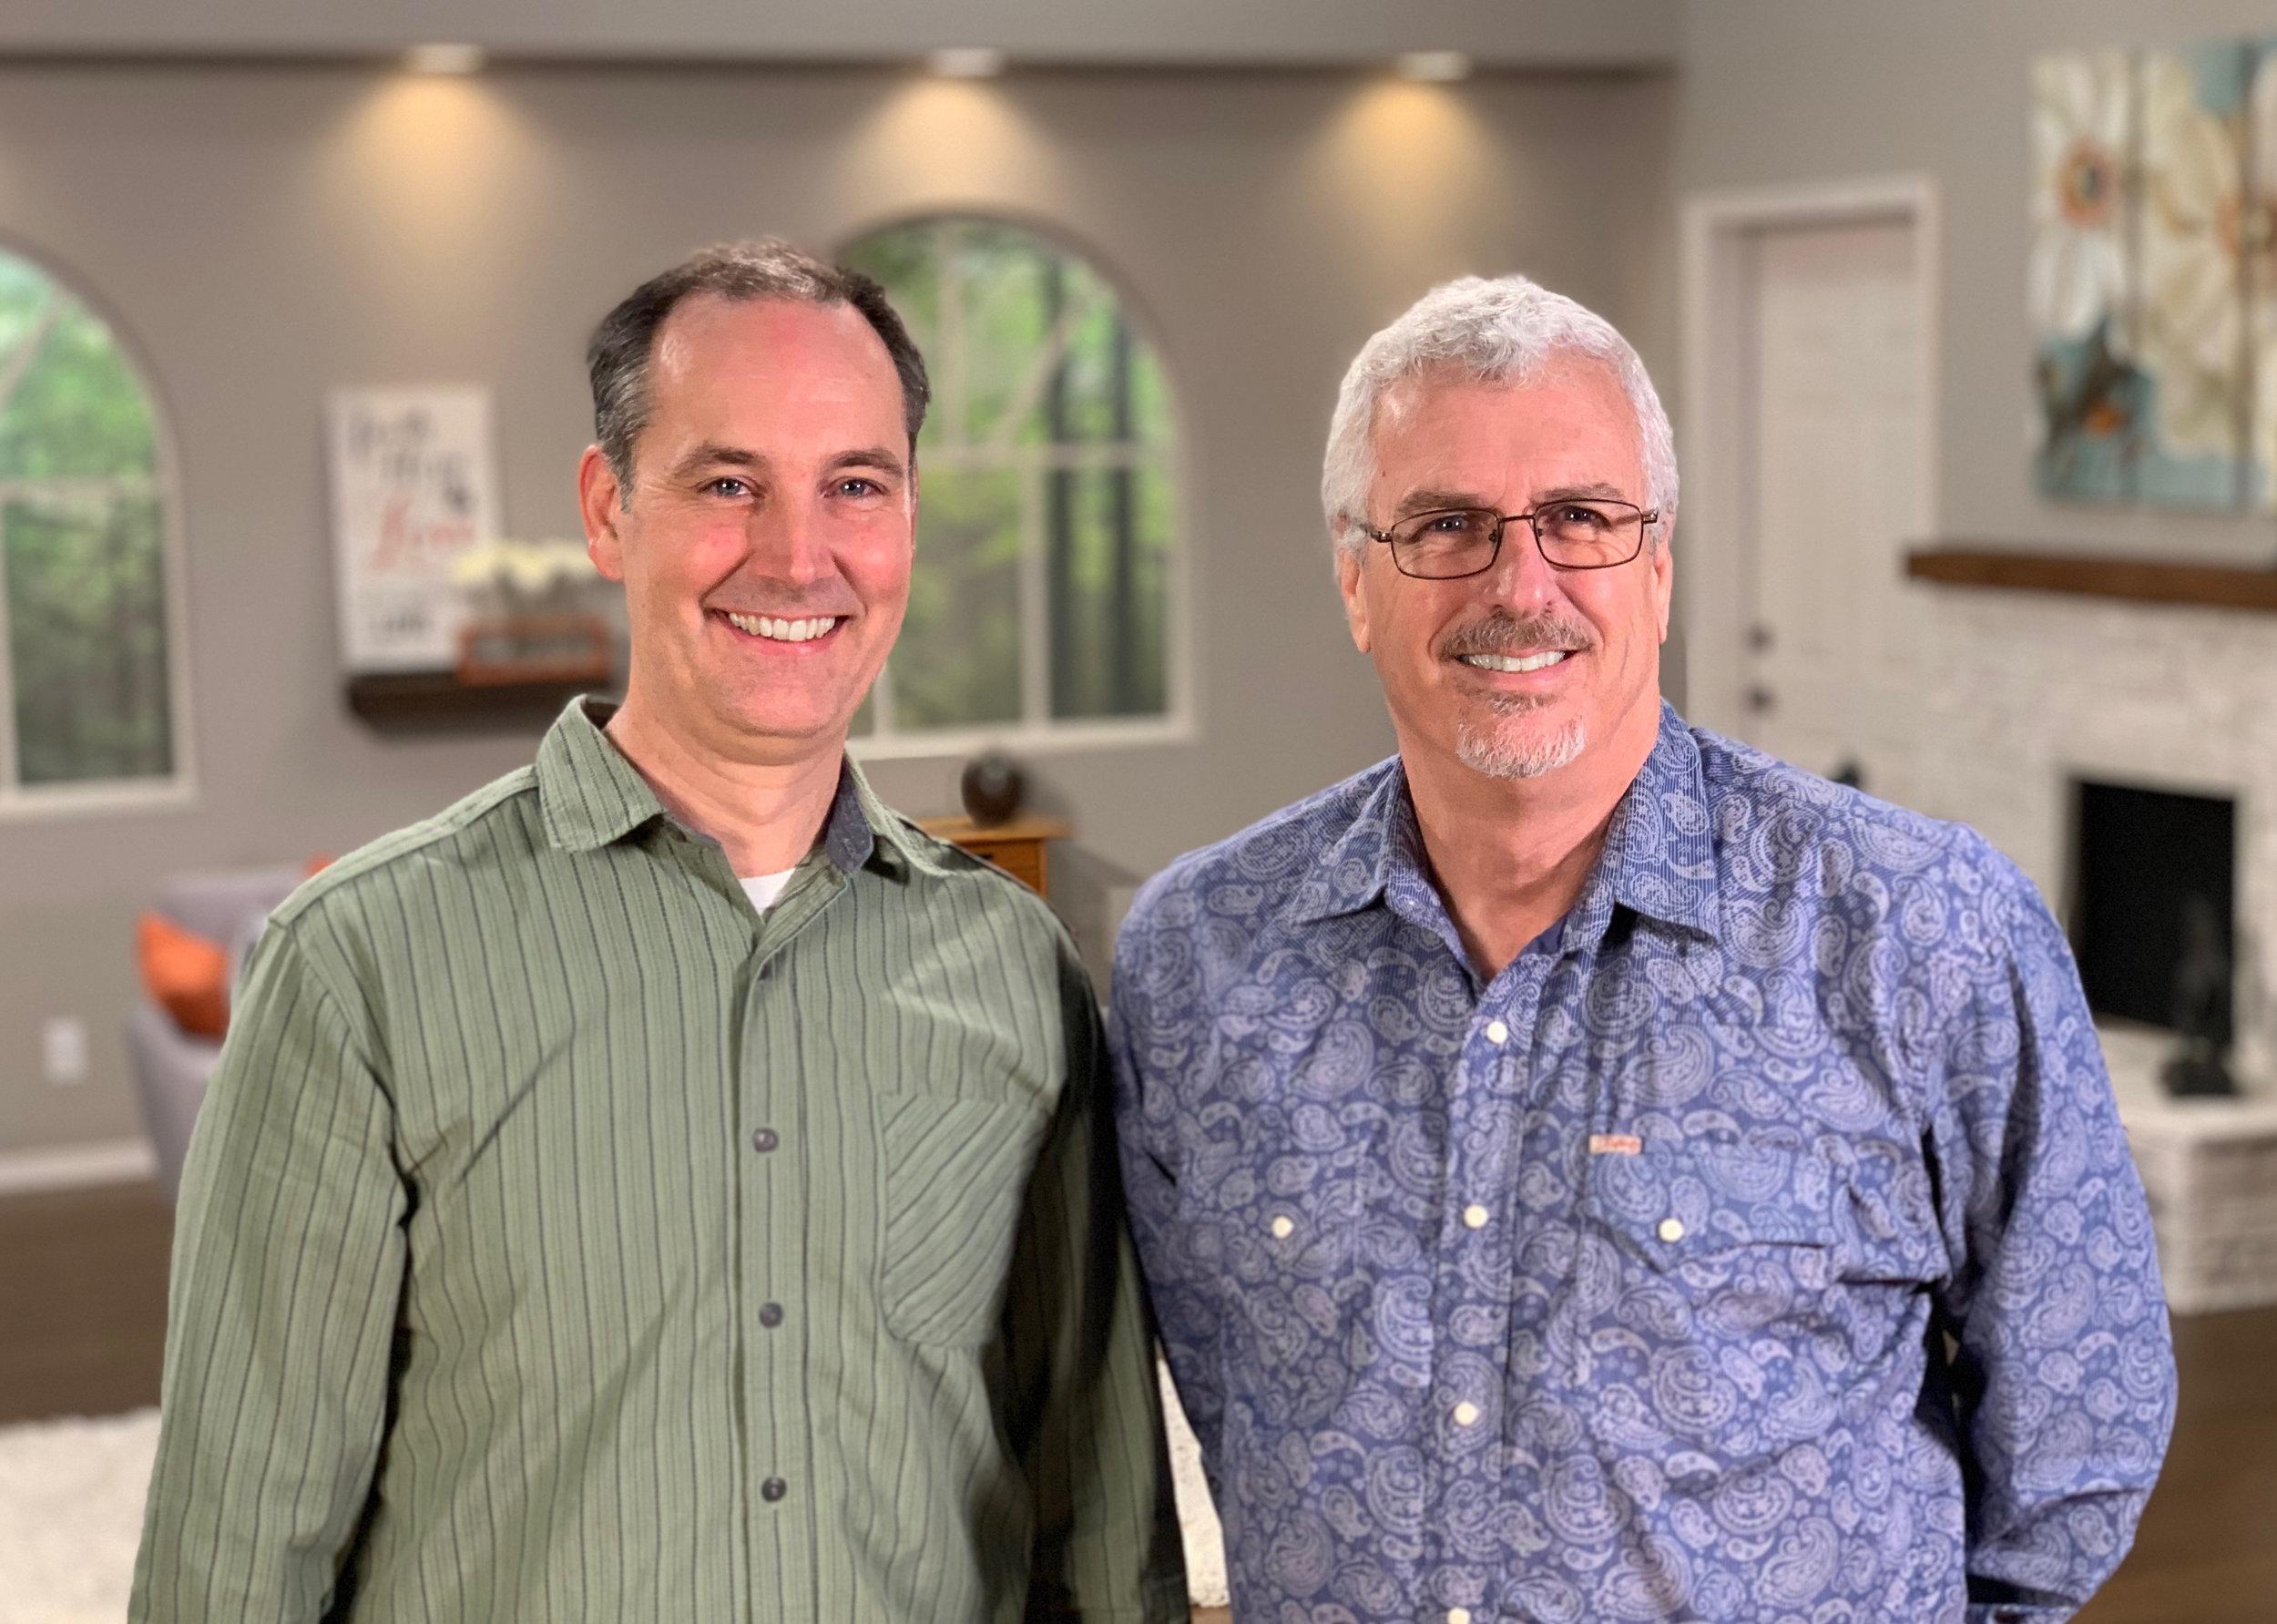 Charlie Oliver & Pastor Kip Bradford